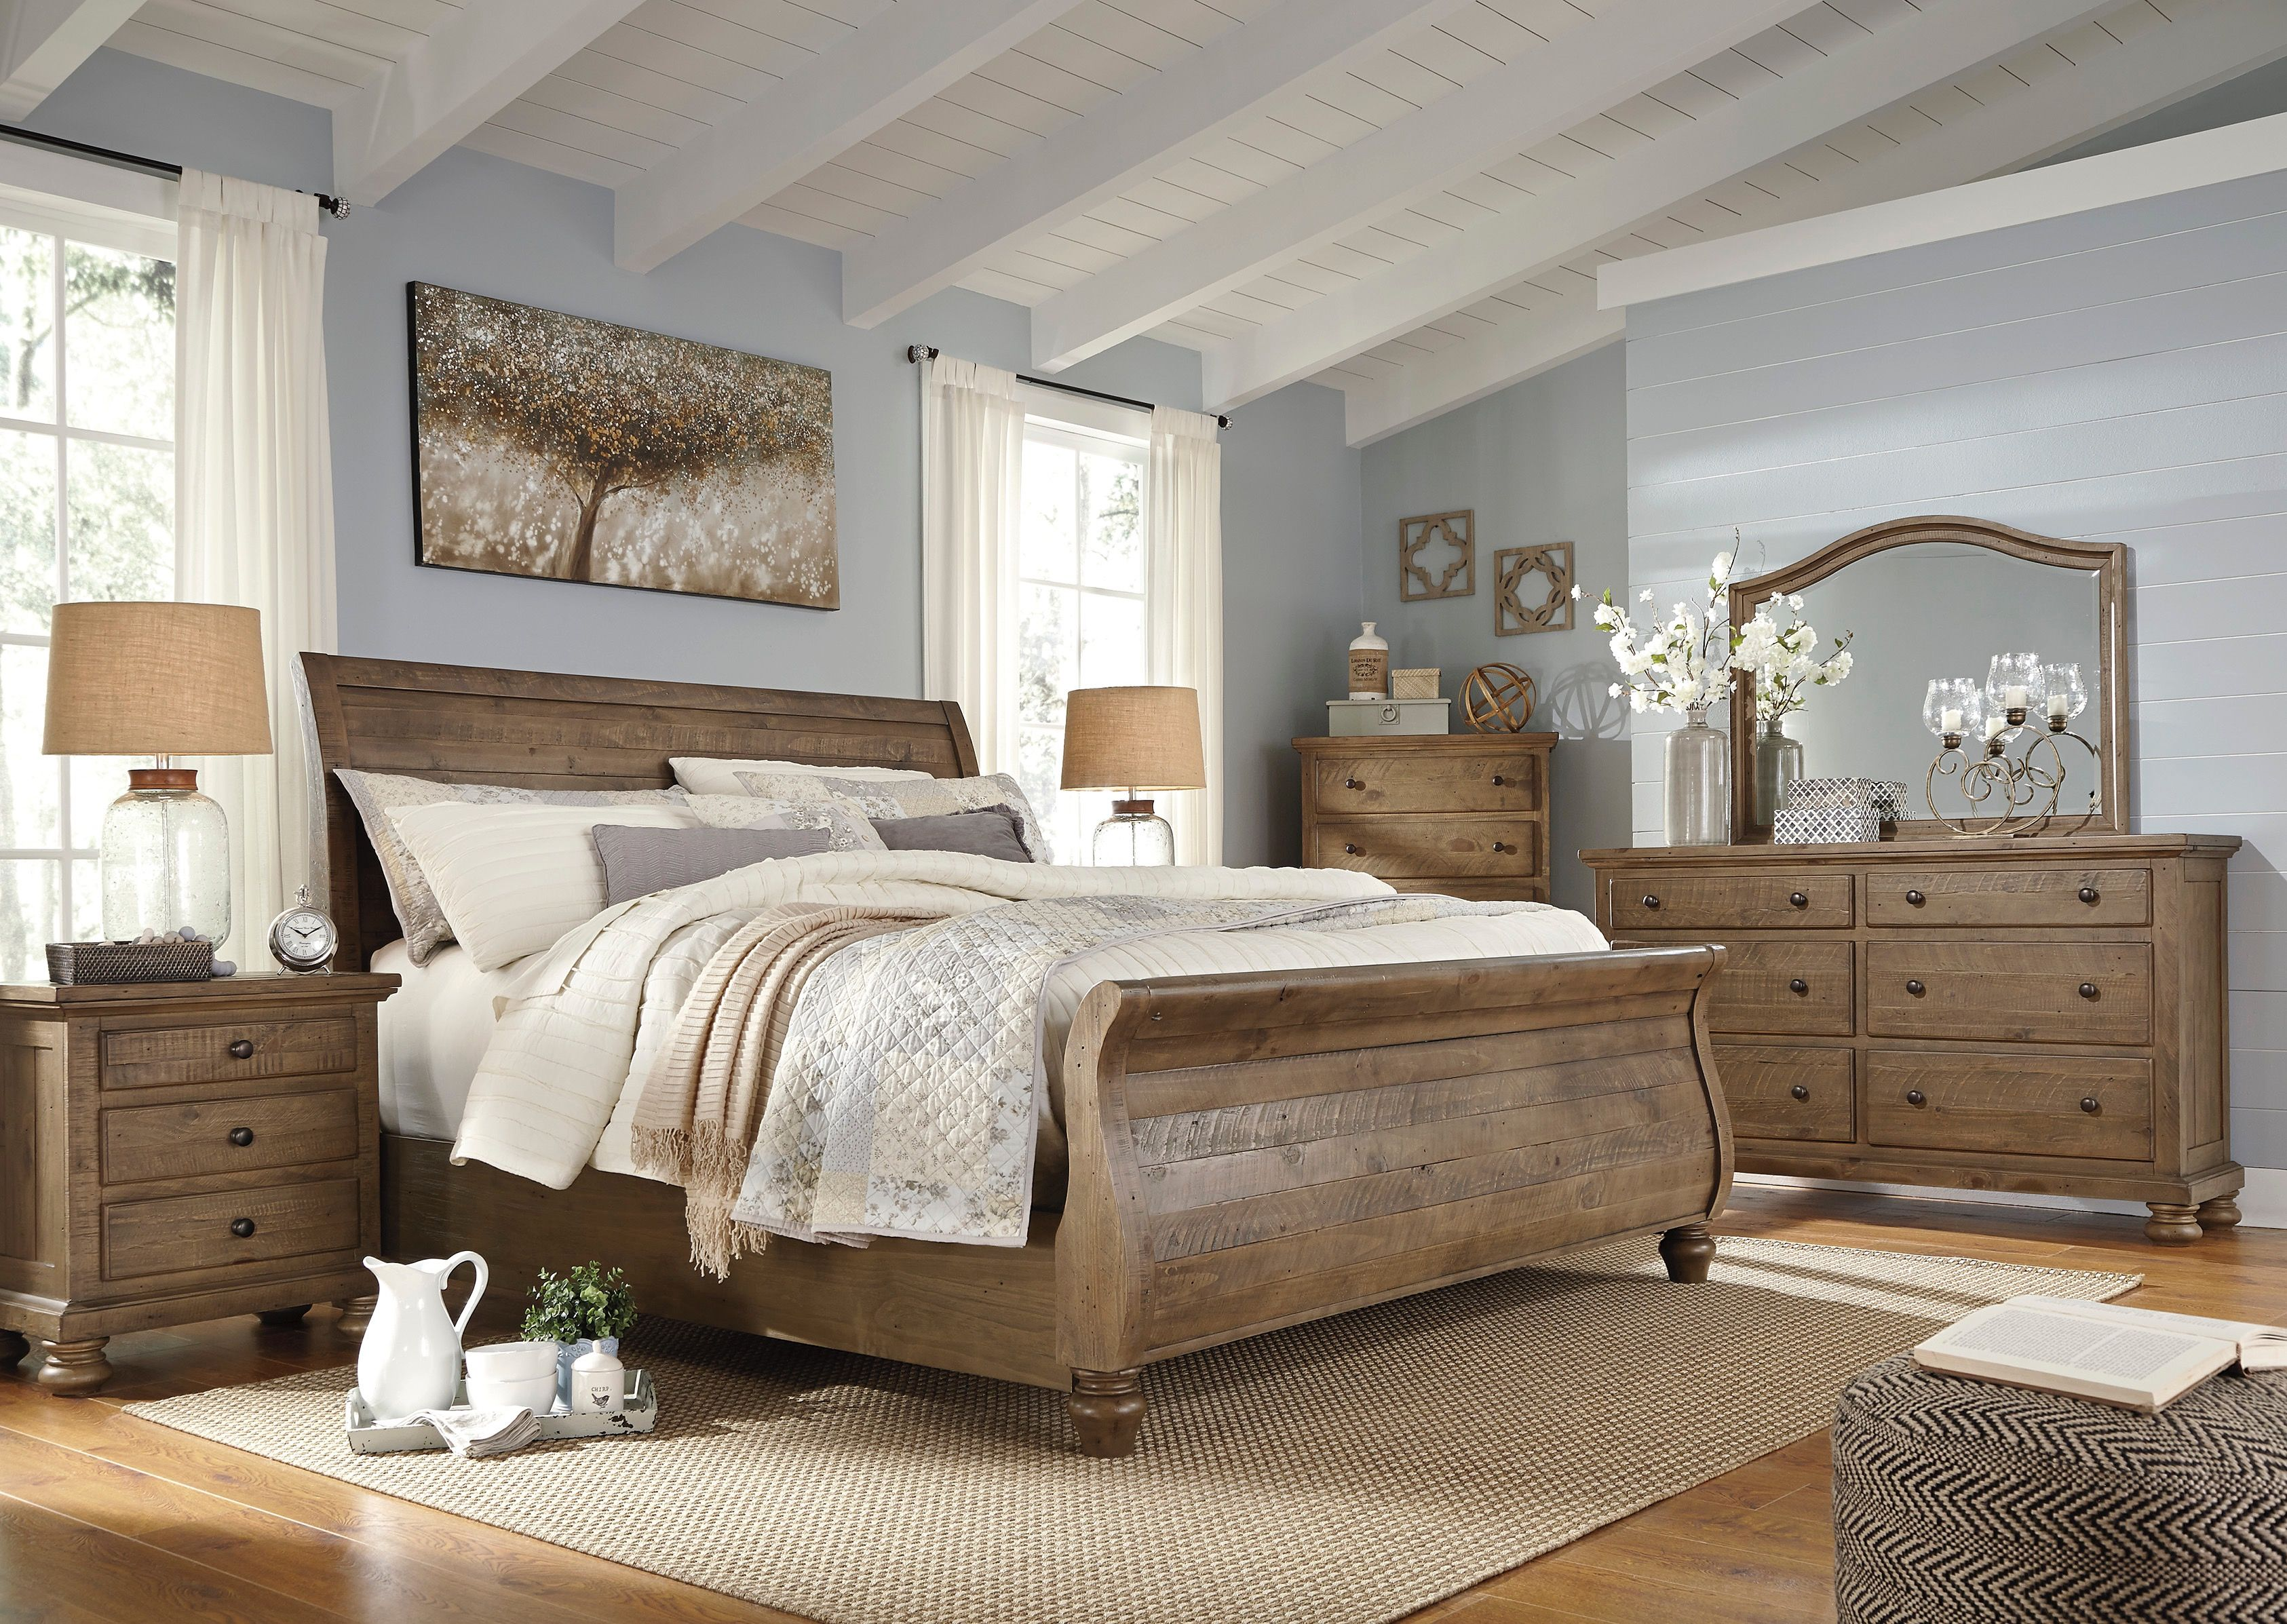 The work of Laura Seppänen | Farmhouse bedroom decor ...